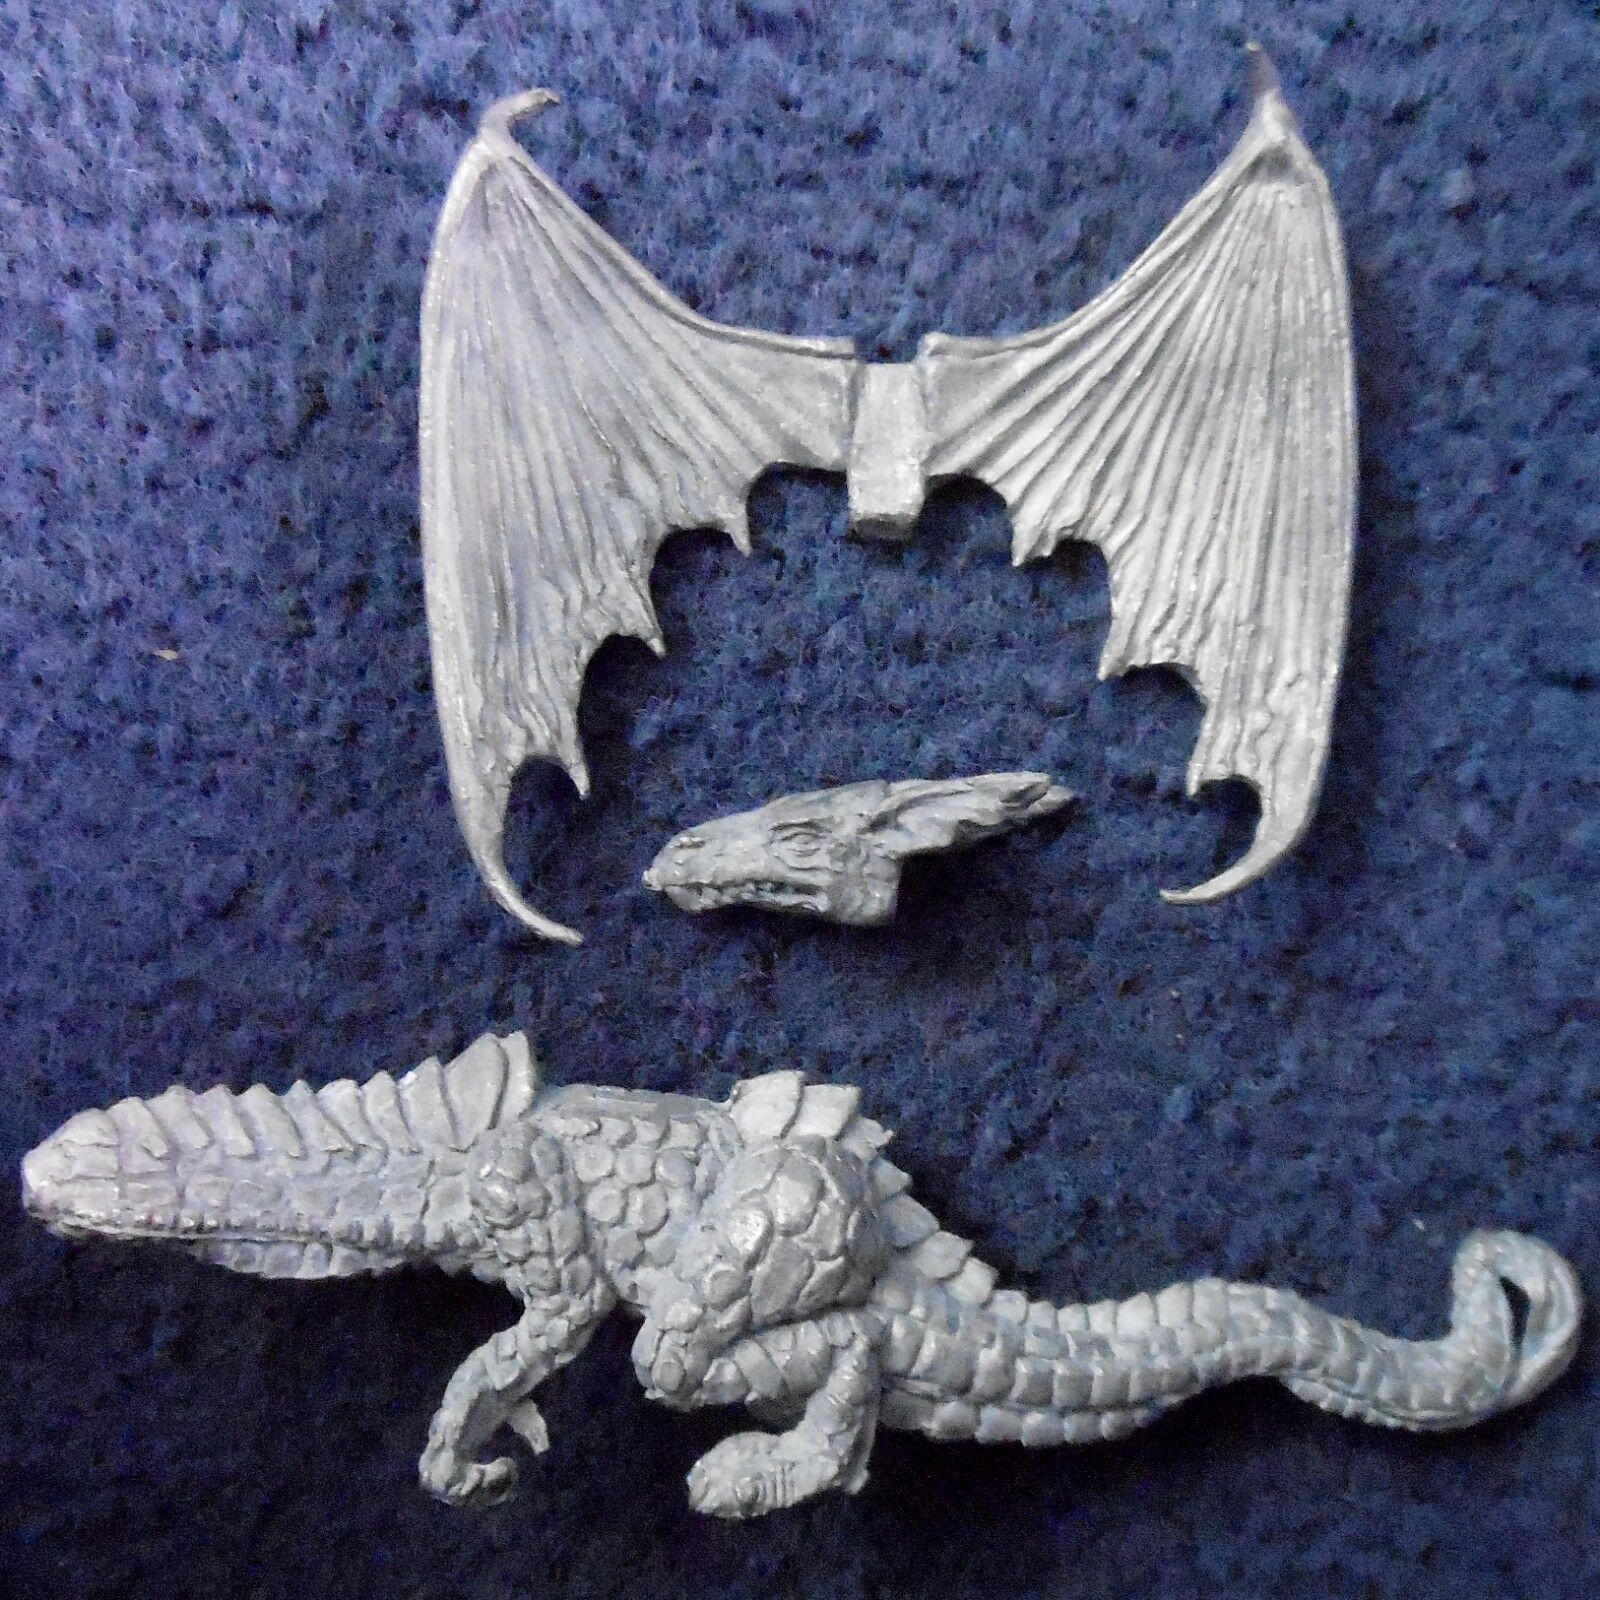 1983 C11 Fire Dungeons & Dragons Games Workshop Citadel Warhammer Esercito AD&D Wyrm